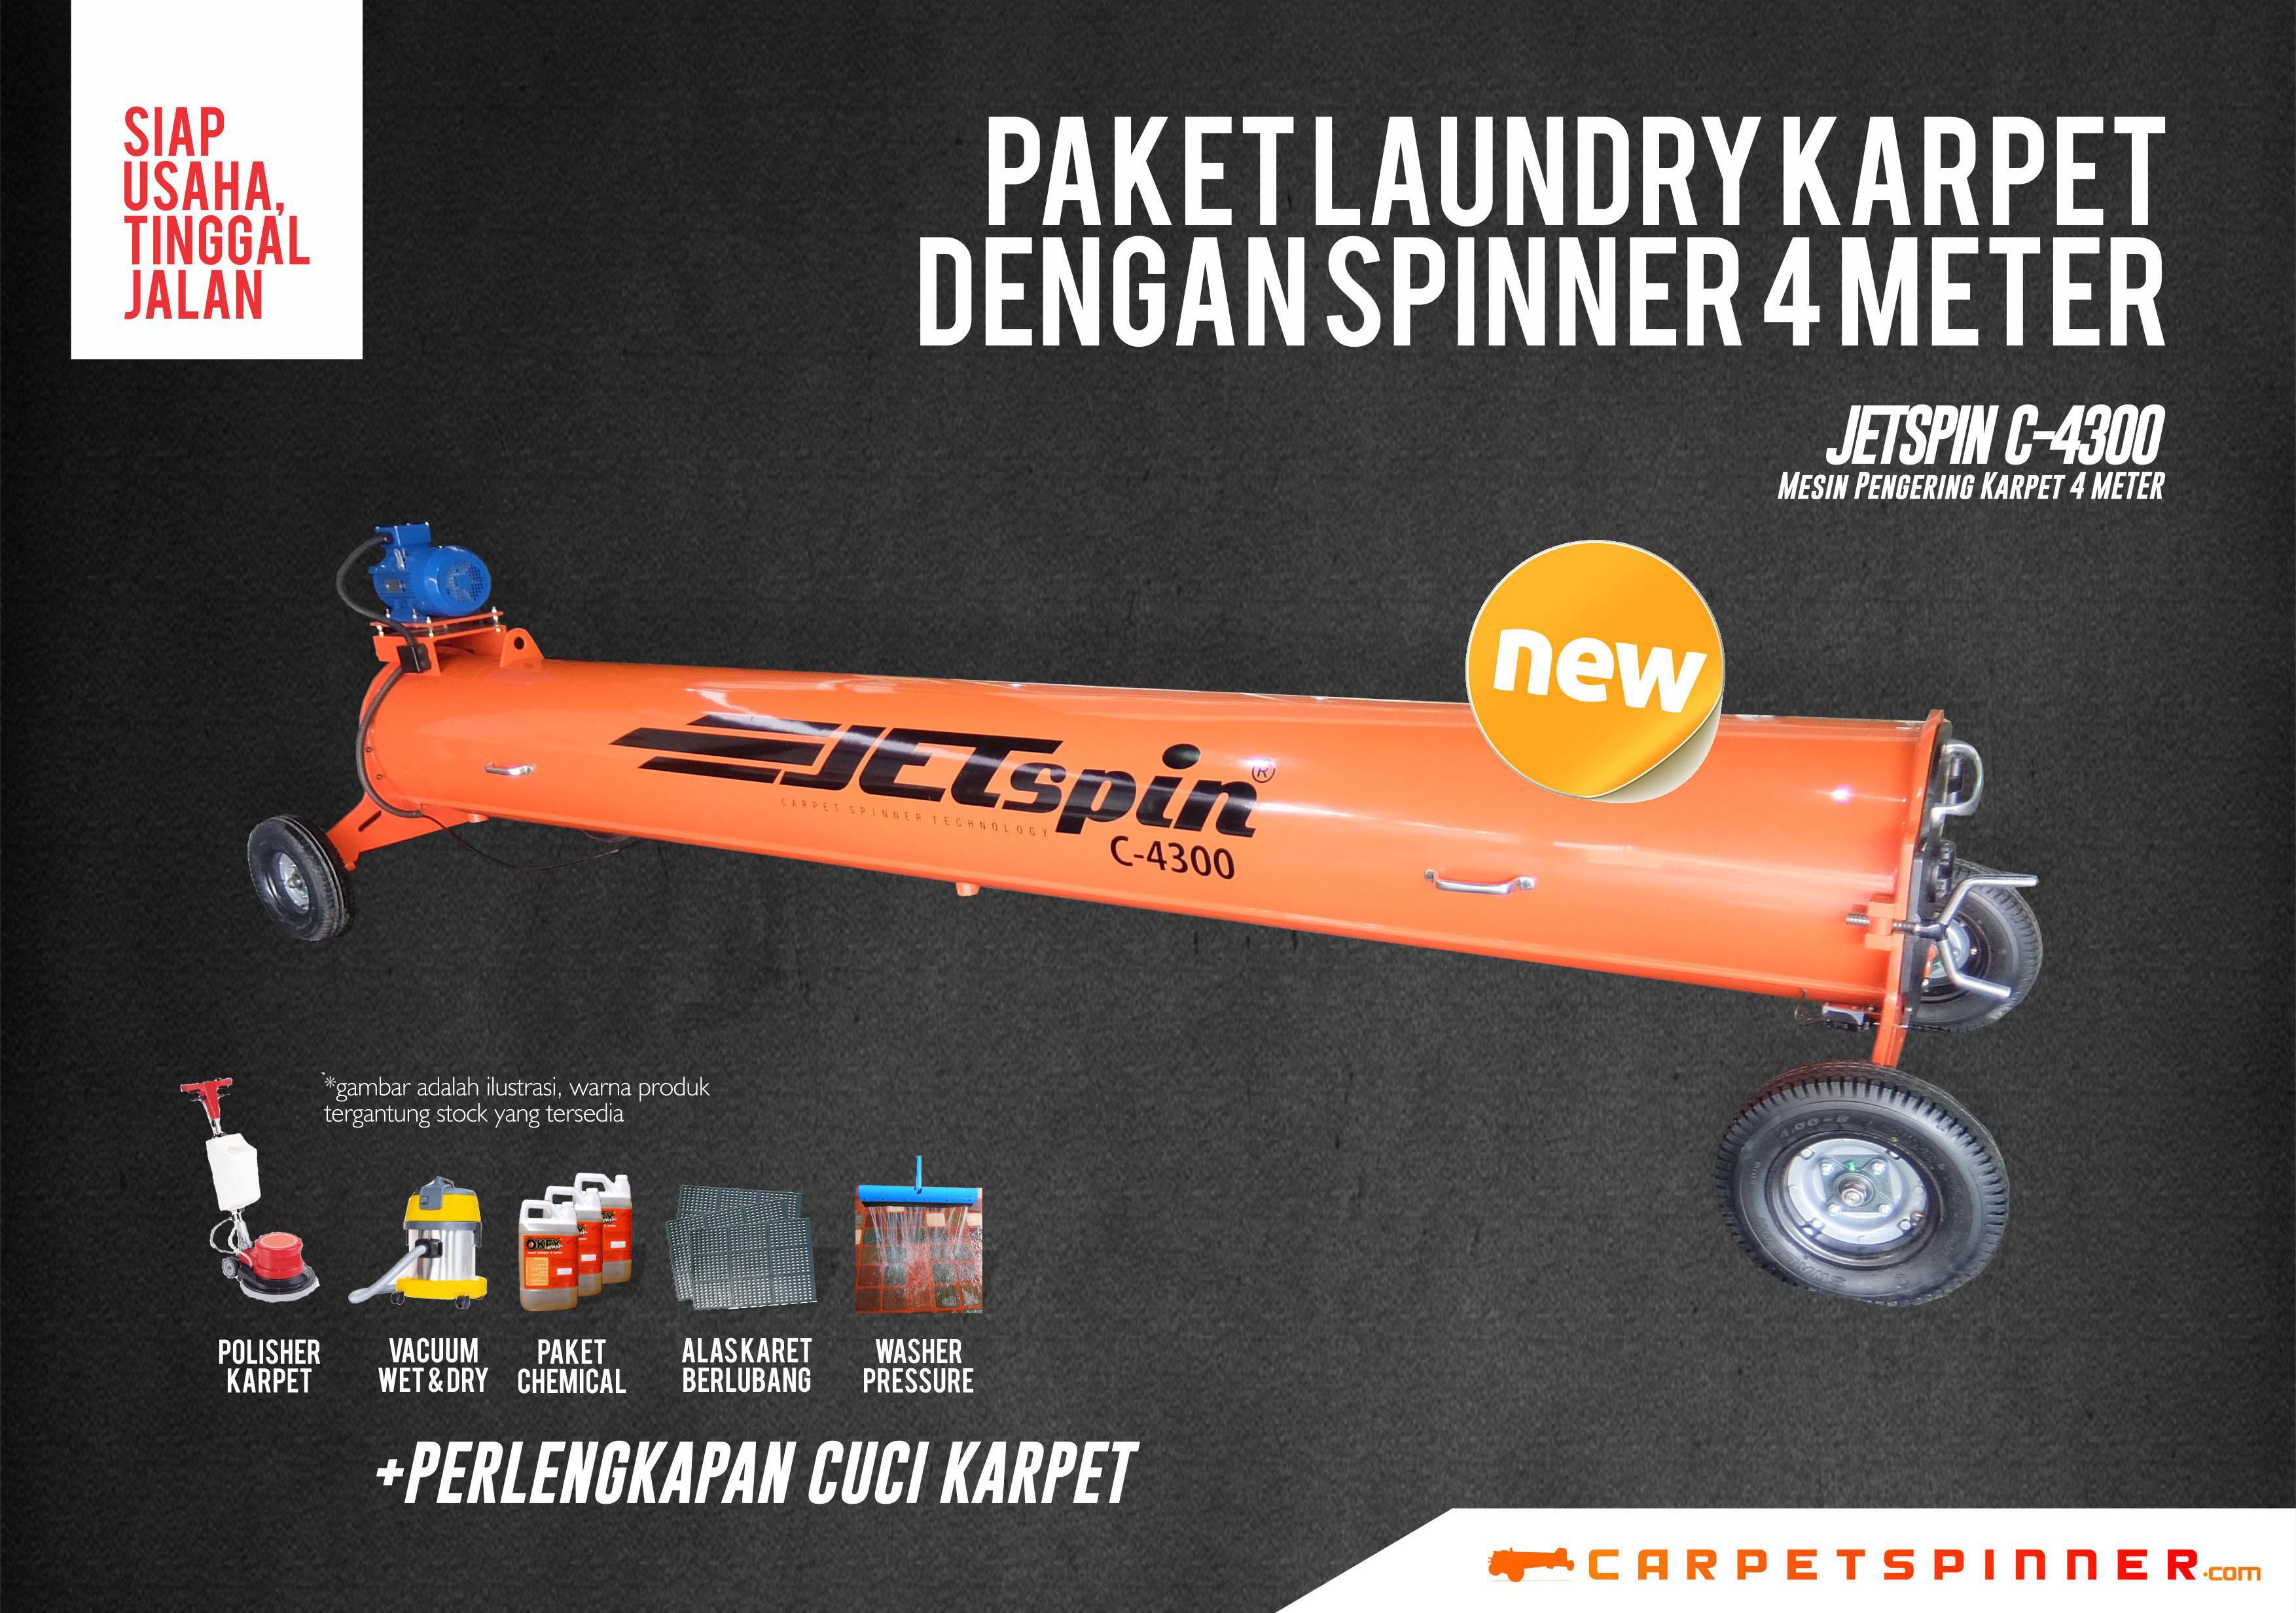 Paket Laundry Karpet Spinner 4 Meter JETSpin C-4300 Carpet Spinner 2019